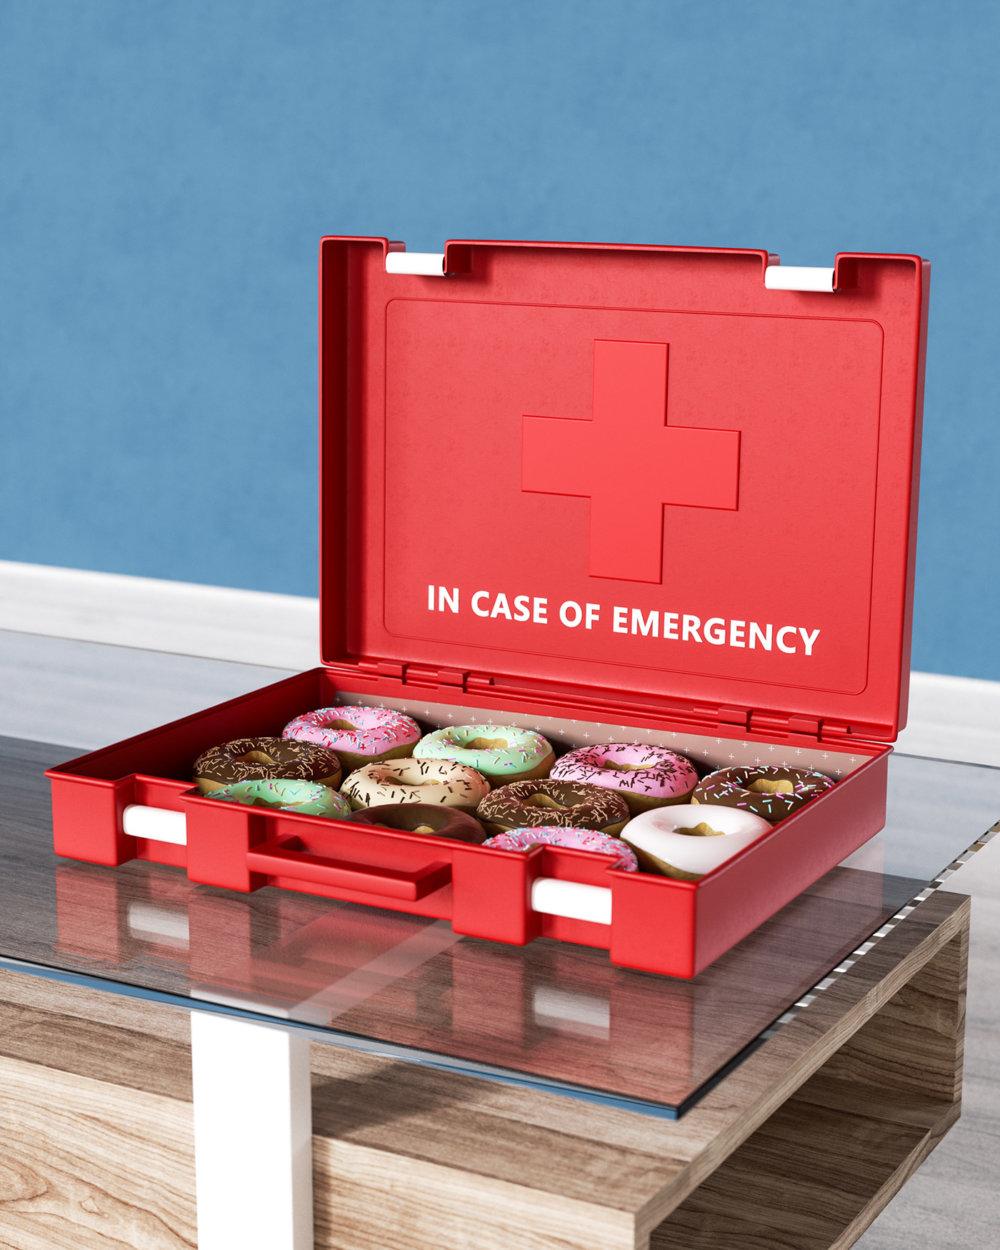 In Case Of Emergency 3d Digital Illustration Series By Ben Fearnley 9